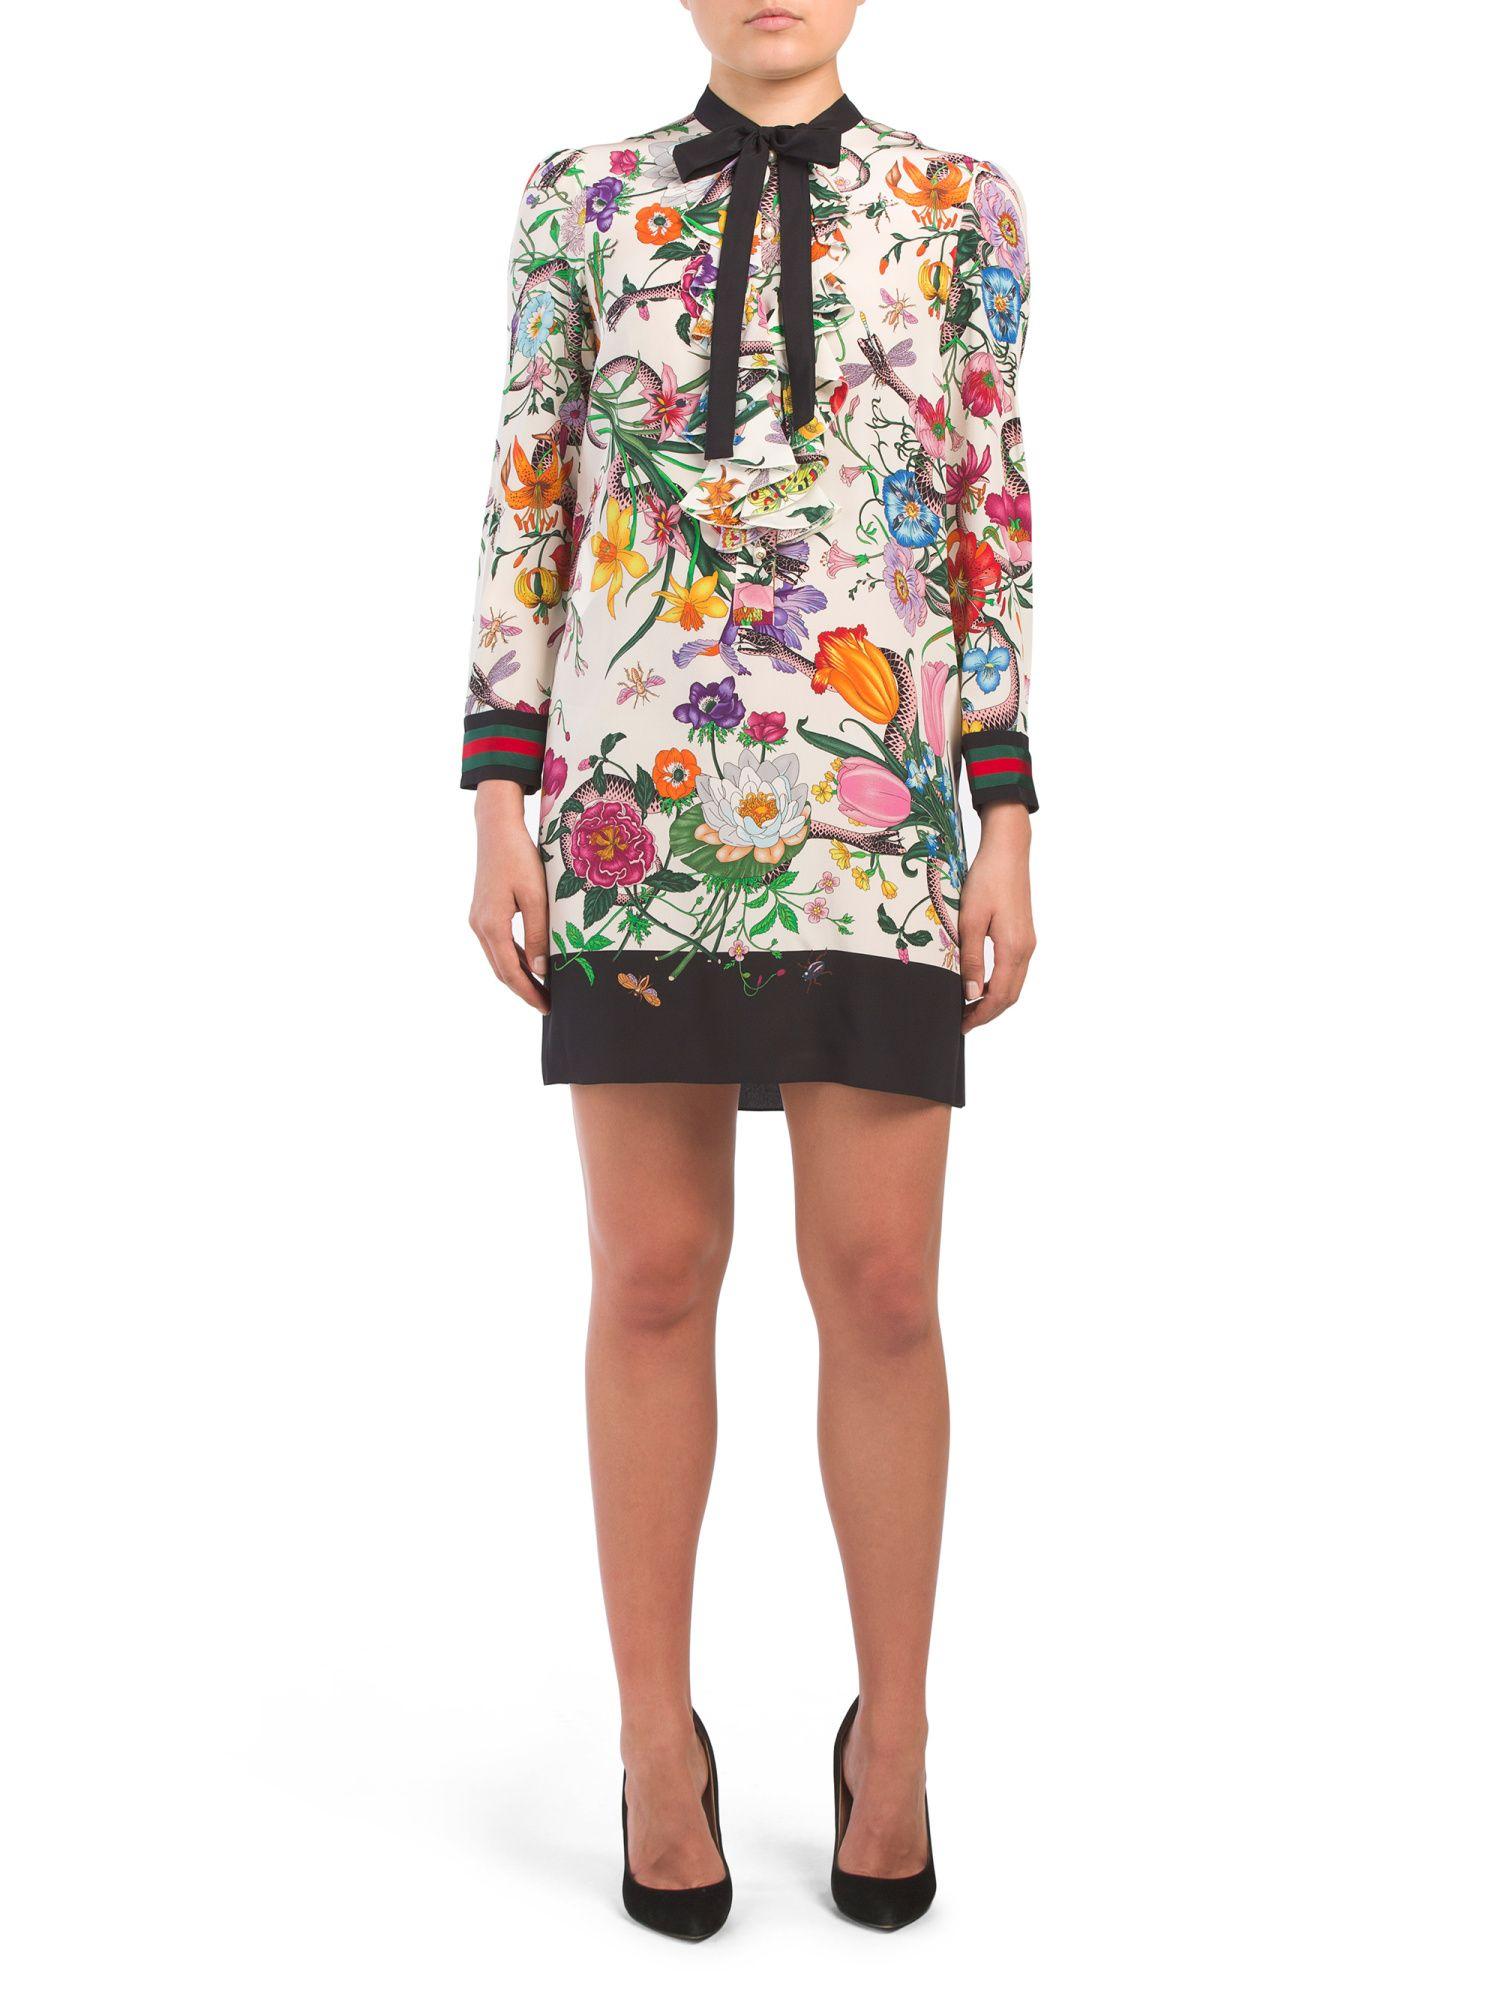 0f73628f6d93 Made In Italy Tie Neck Silk Floral Dress - Women - T.J.Maxx ...